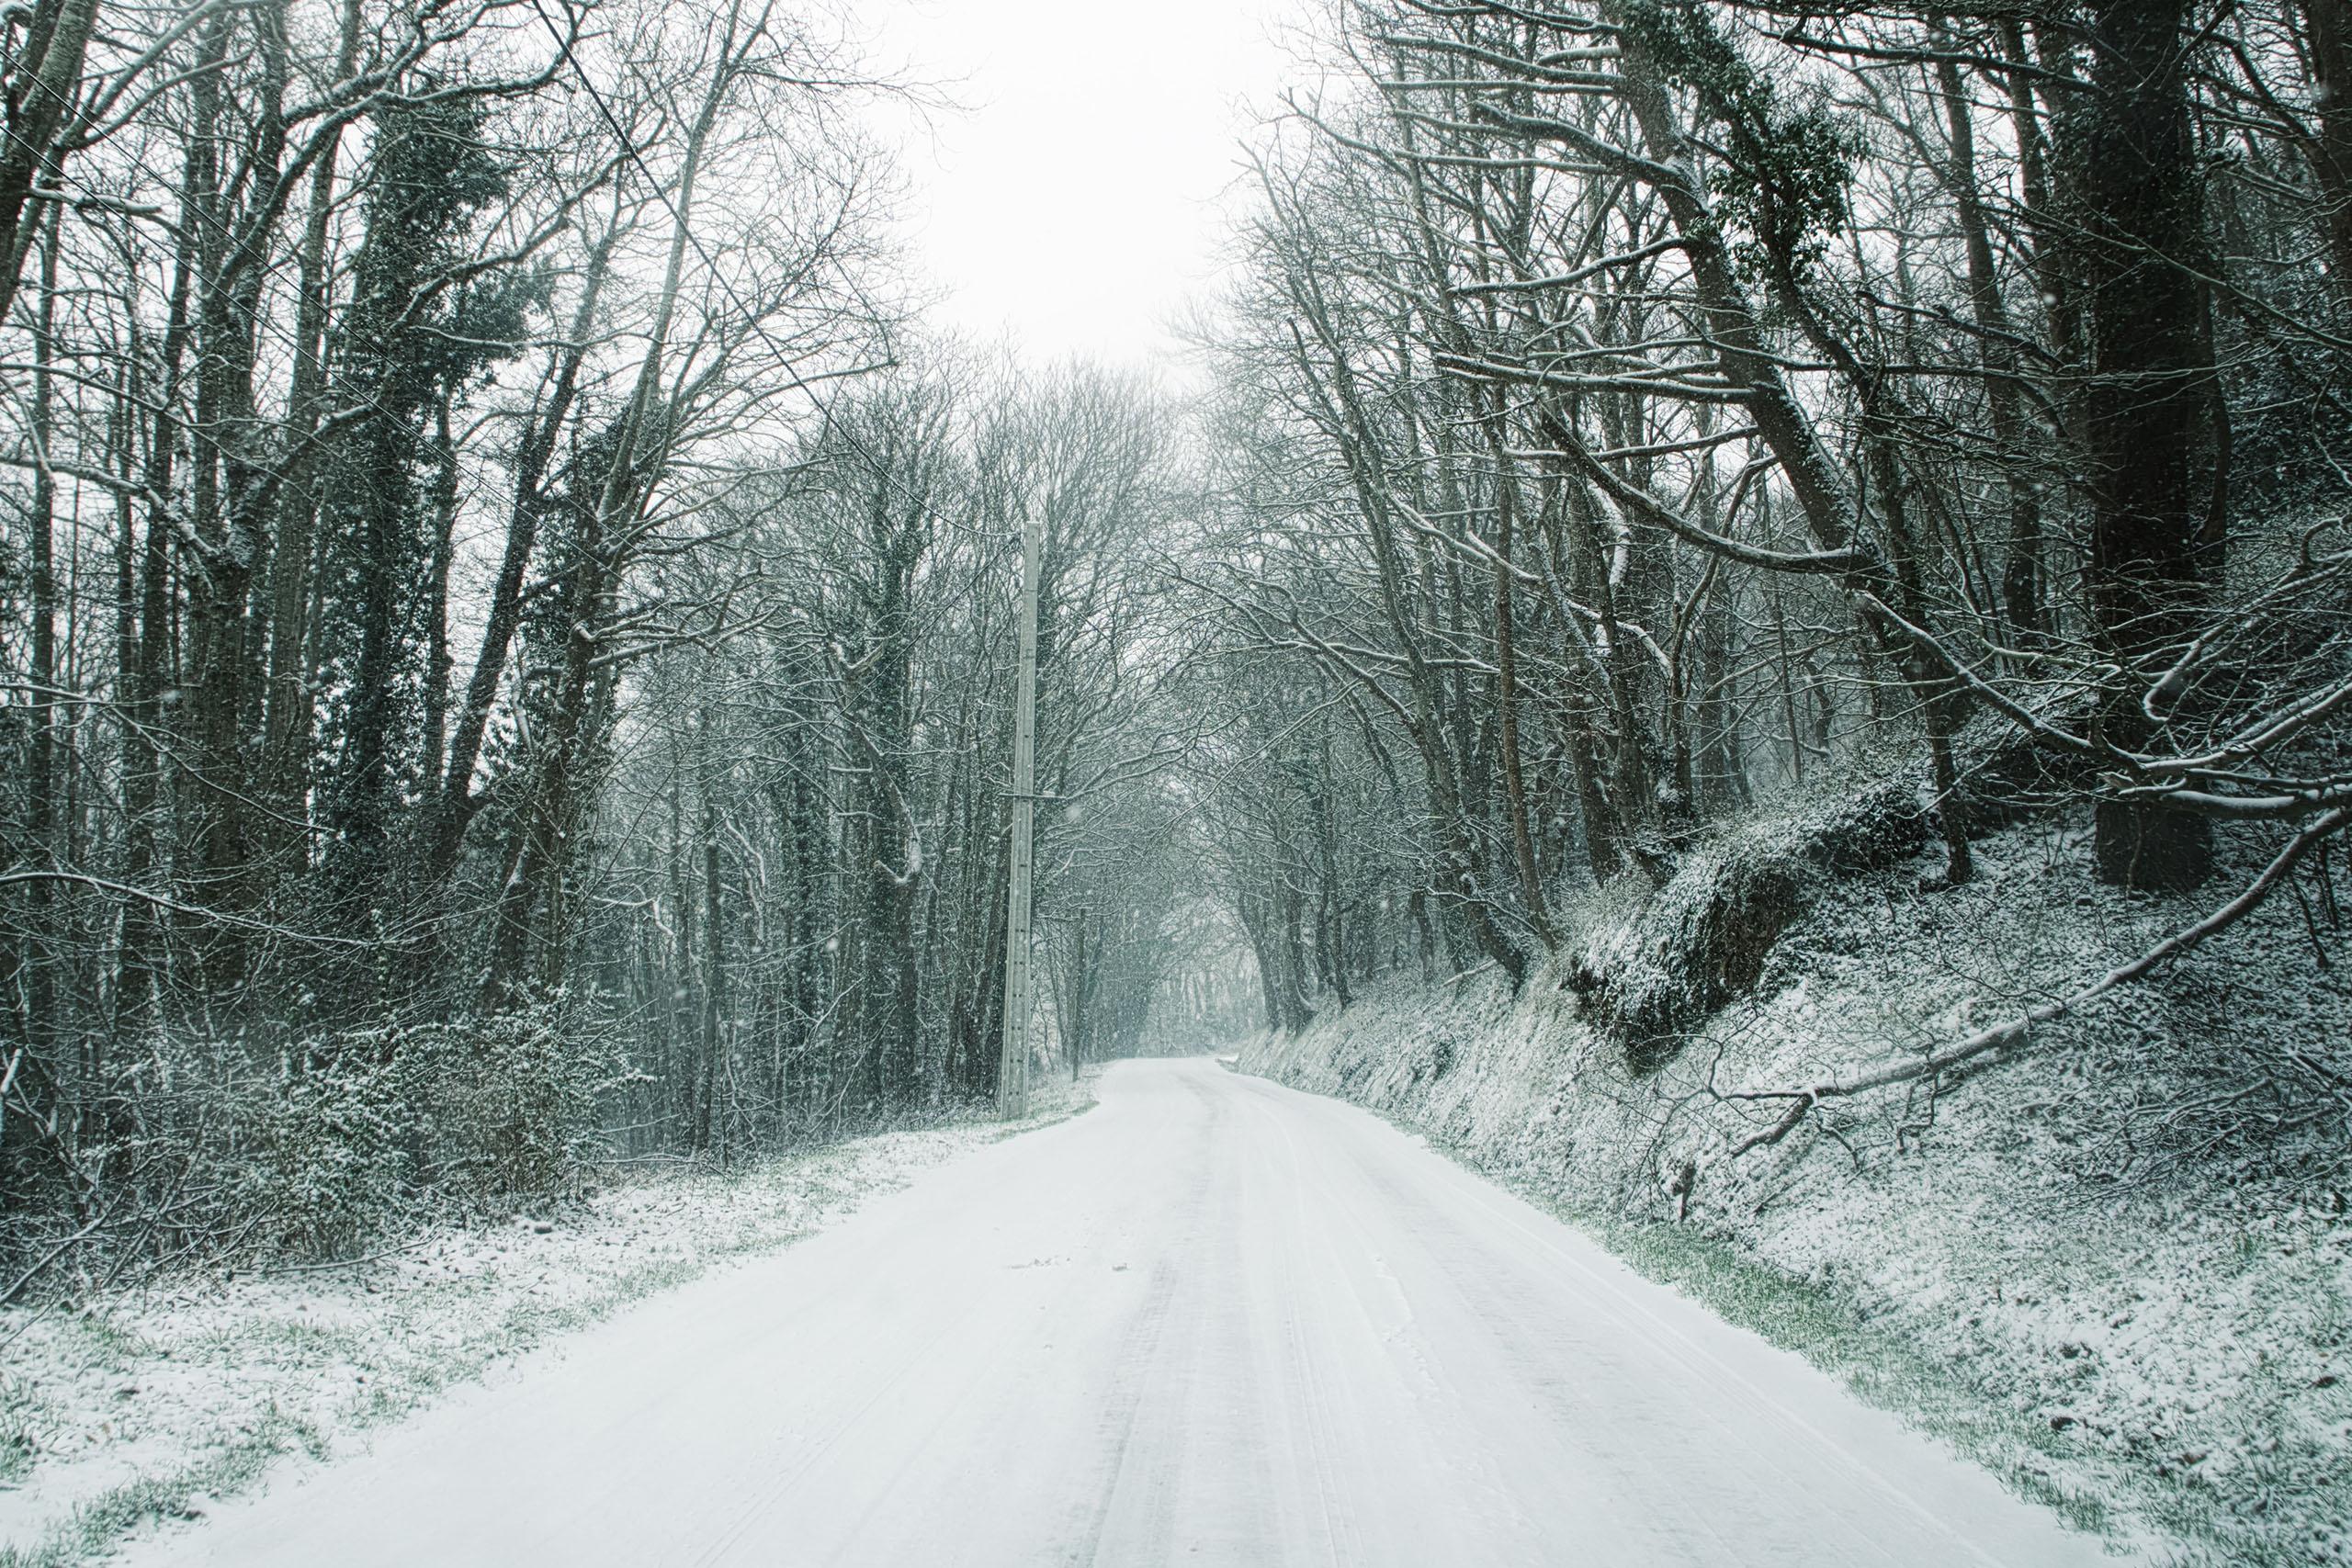 It's snowing, everyone PANIC!